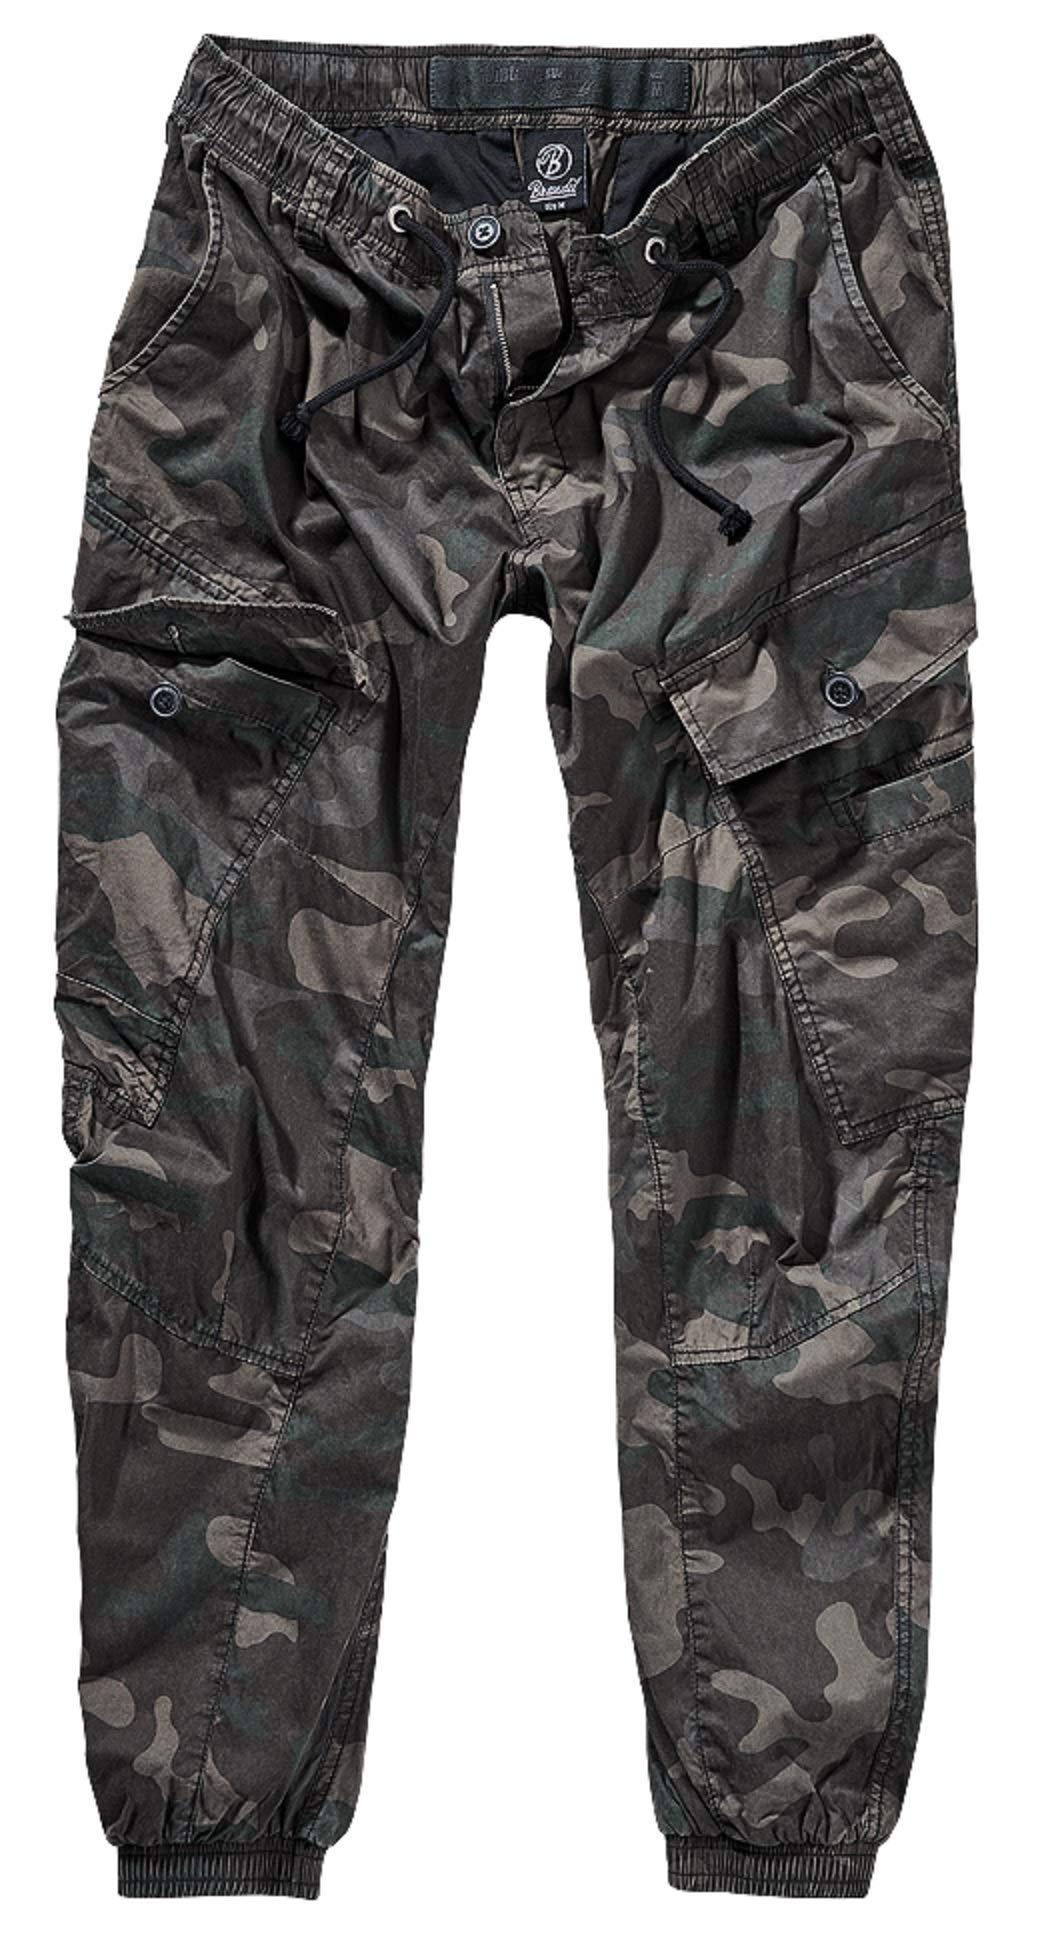 HELIKON TEX 3 Color Desert BDU ARMY Outdoor Cargo Bermuda Shorts US Pantalon court